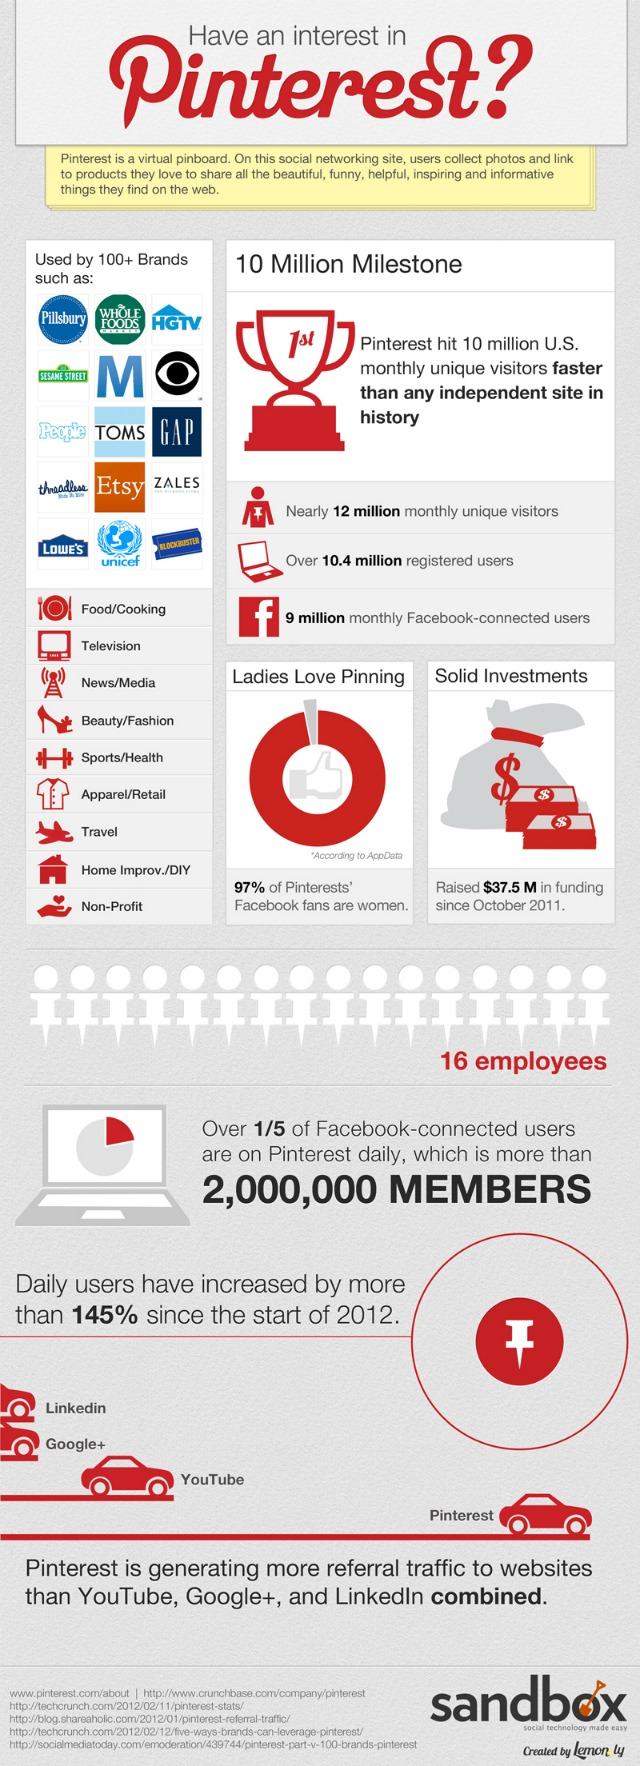 Pinterest-infographic-2012